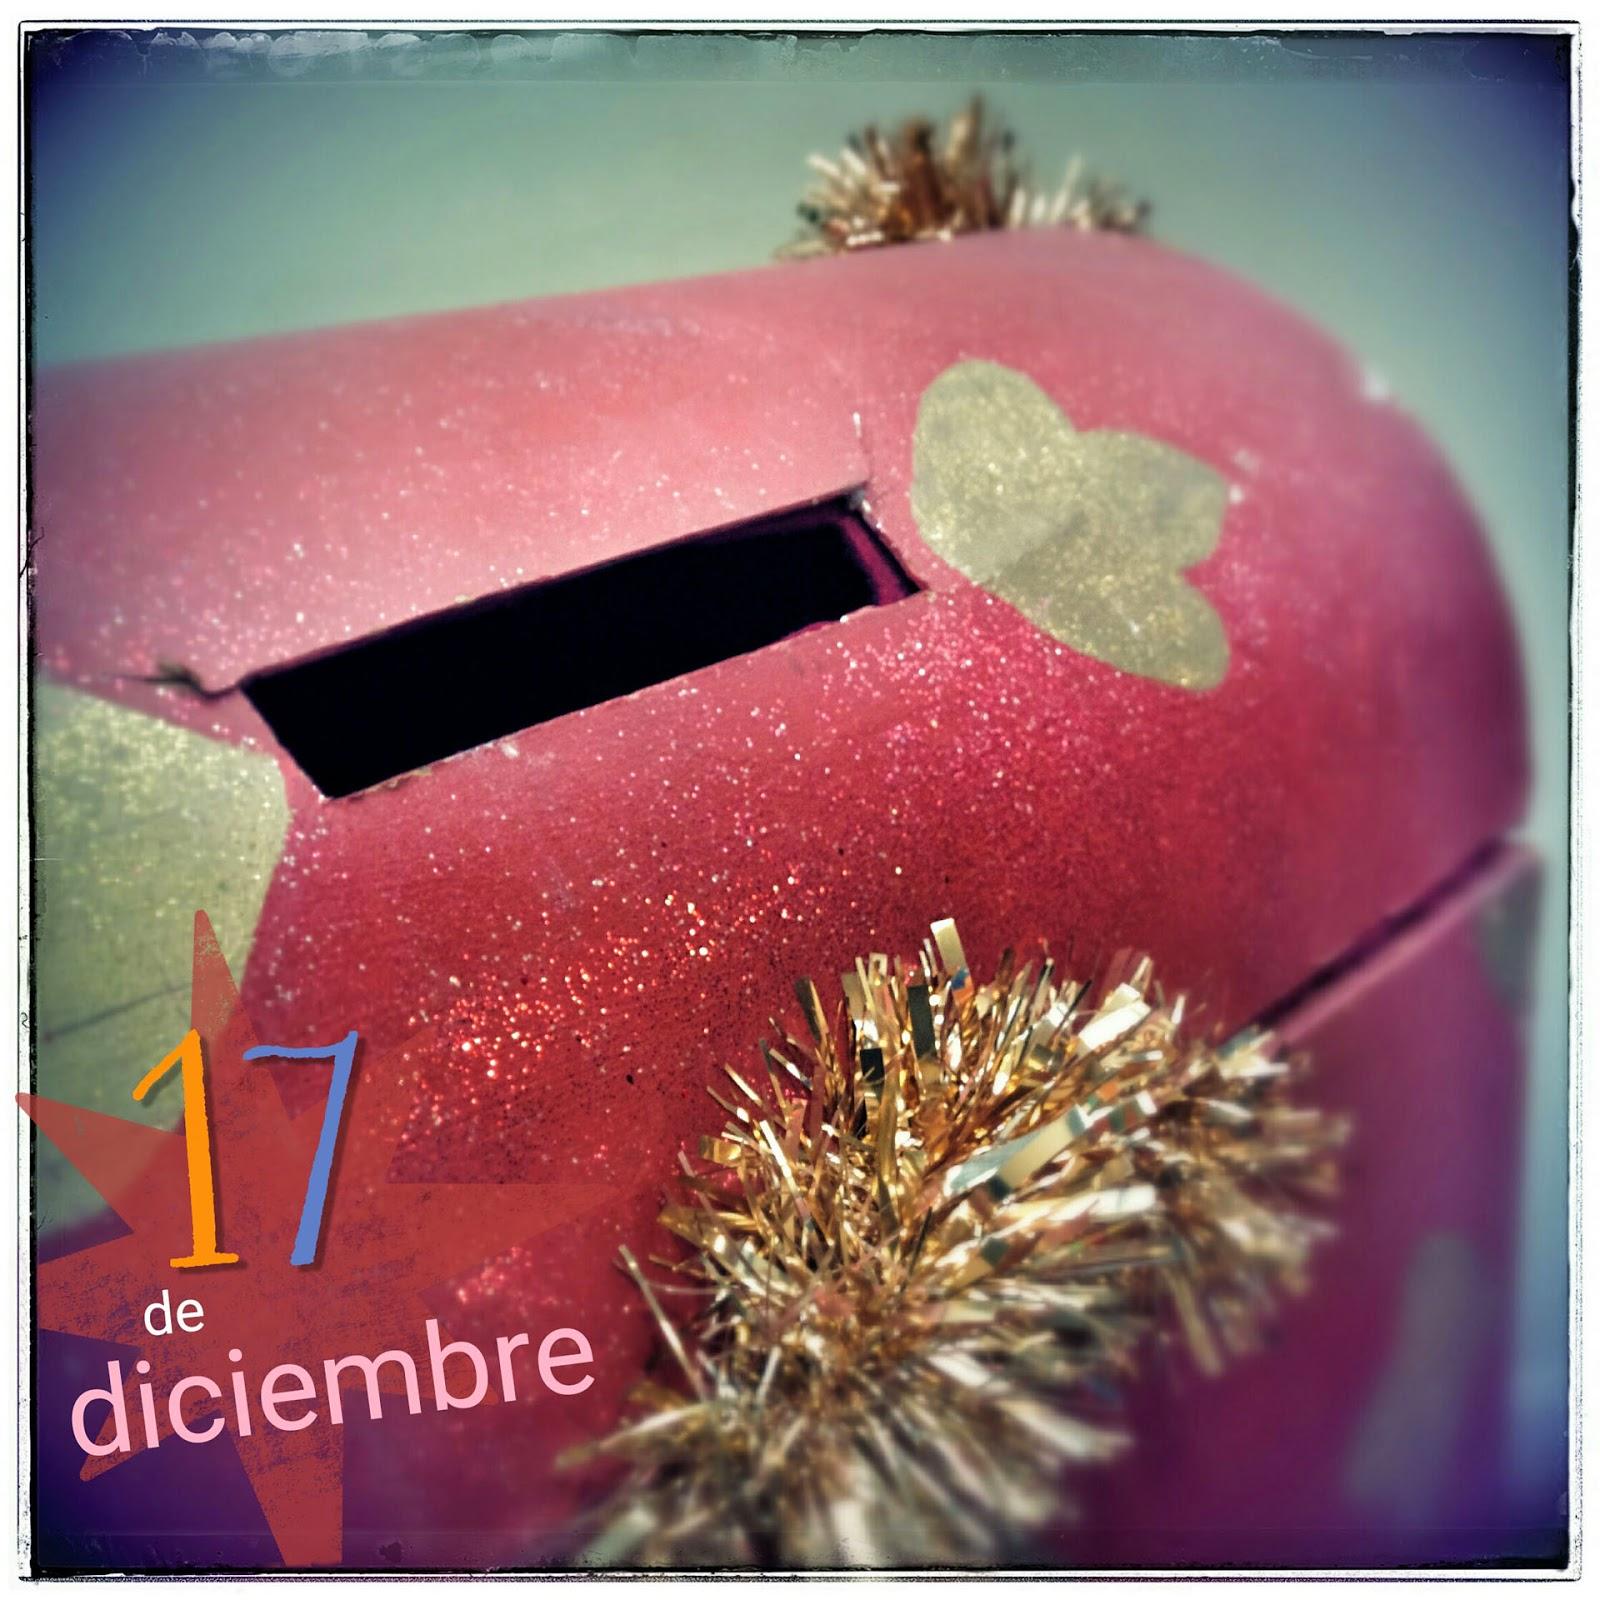 17 de diciembre: